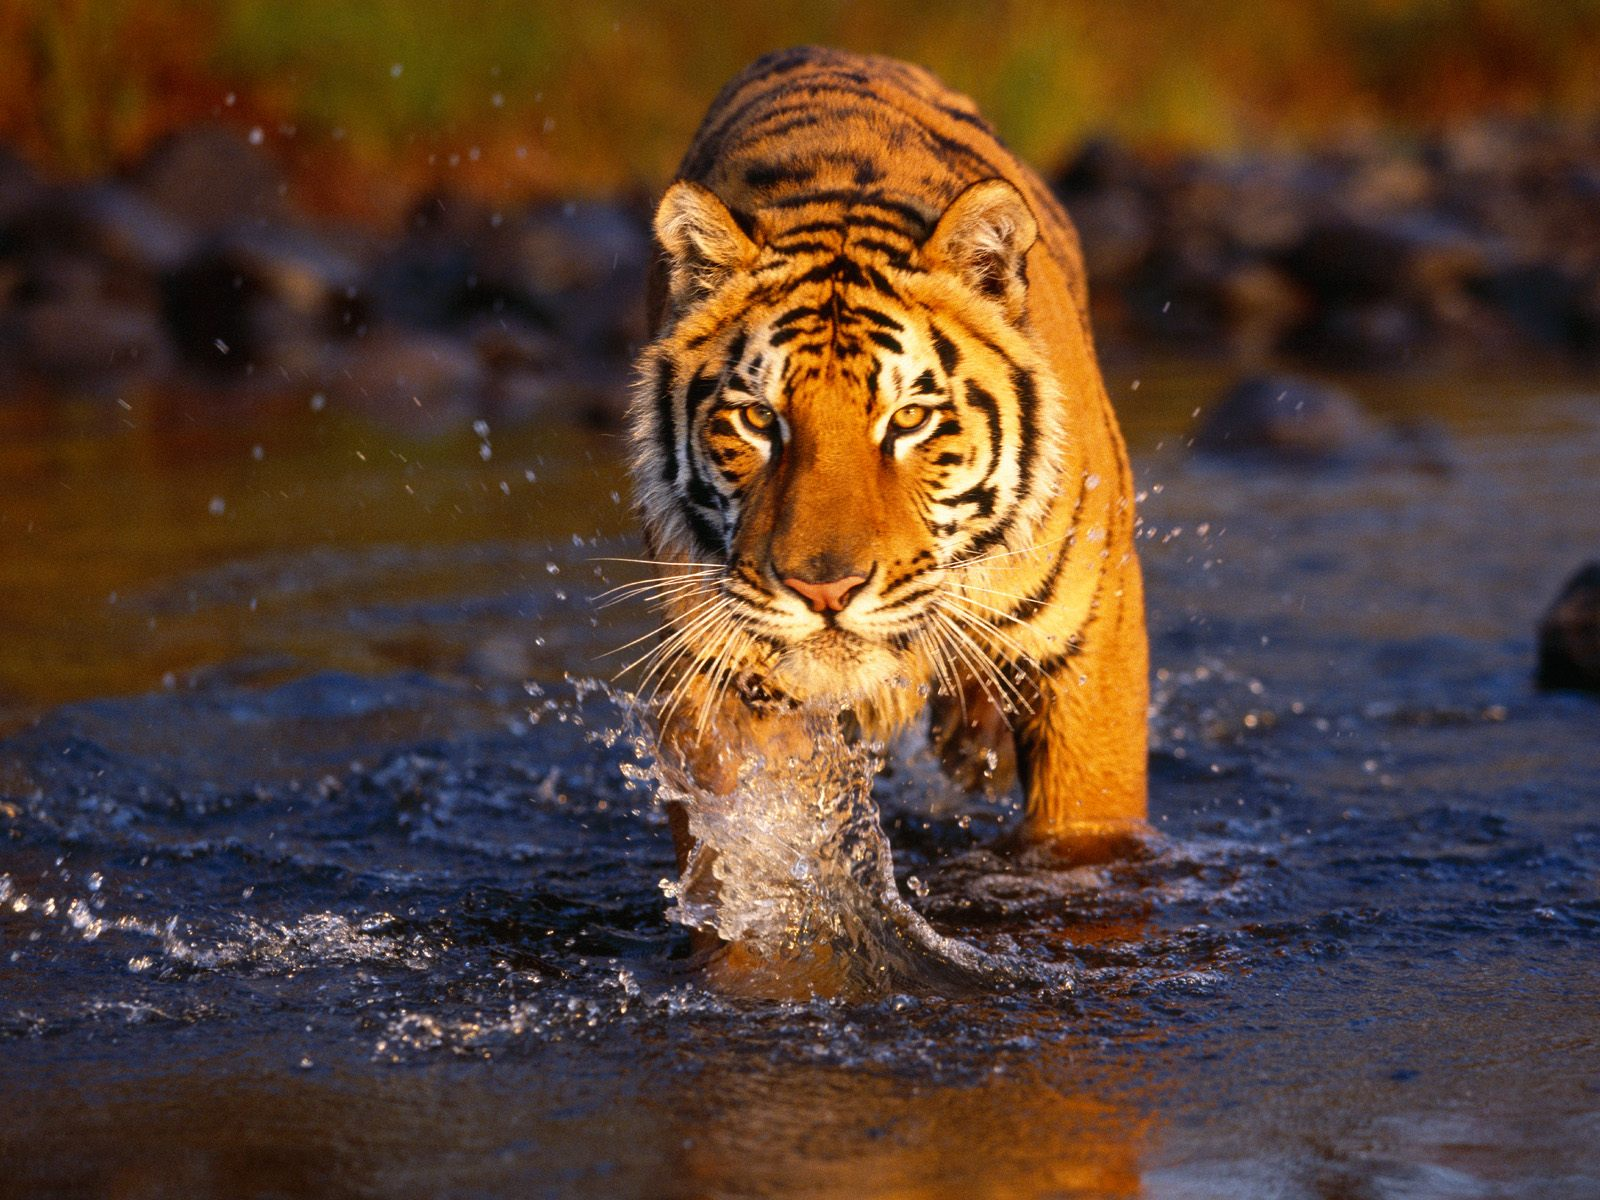 tiger wallpapers desktop HD photo images 9jpg 1600x1200